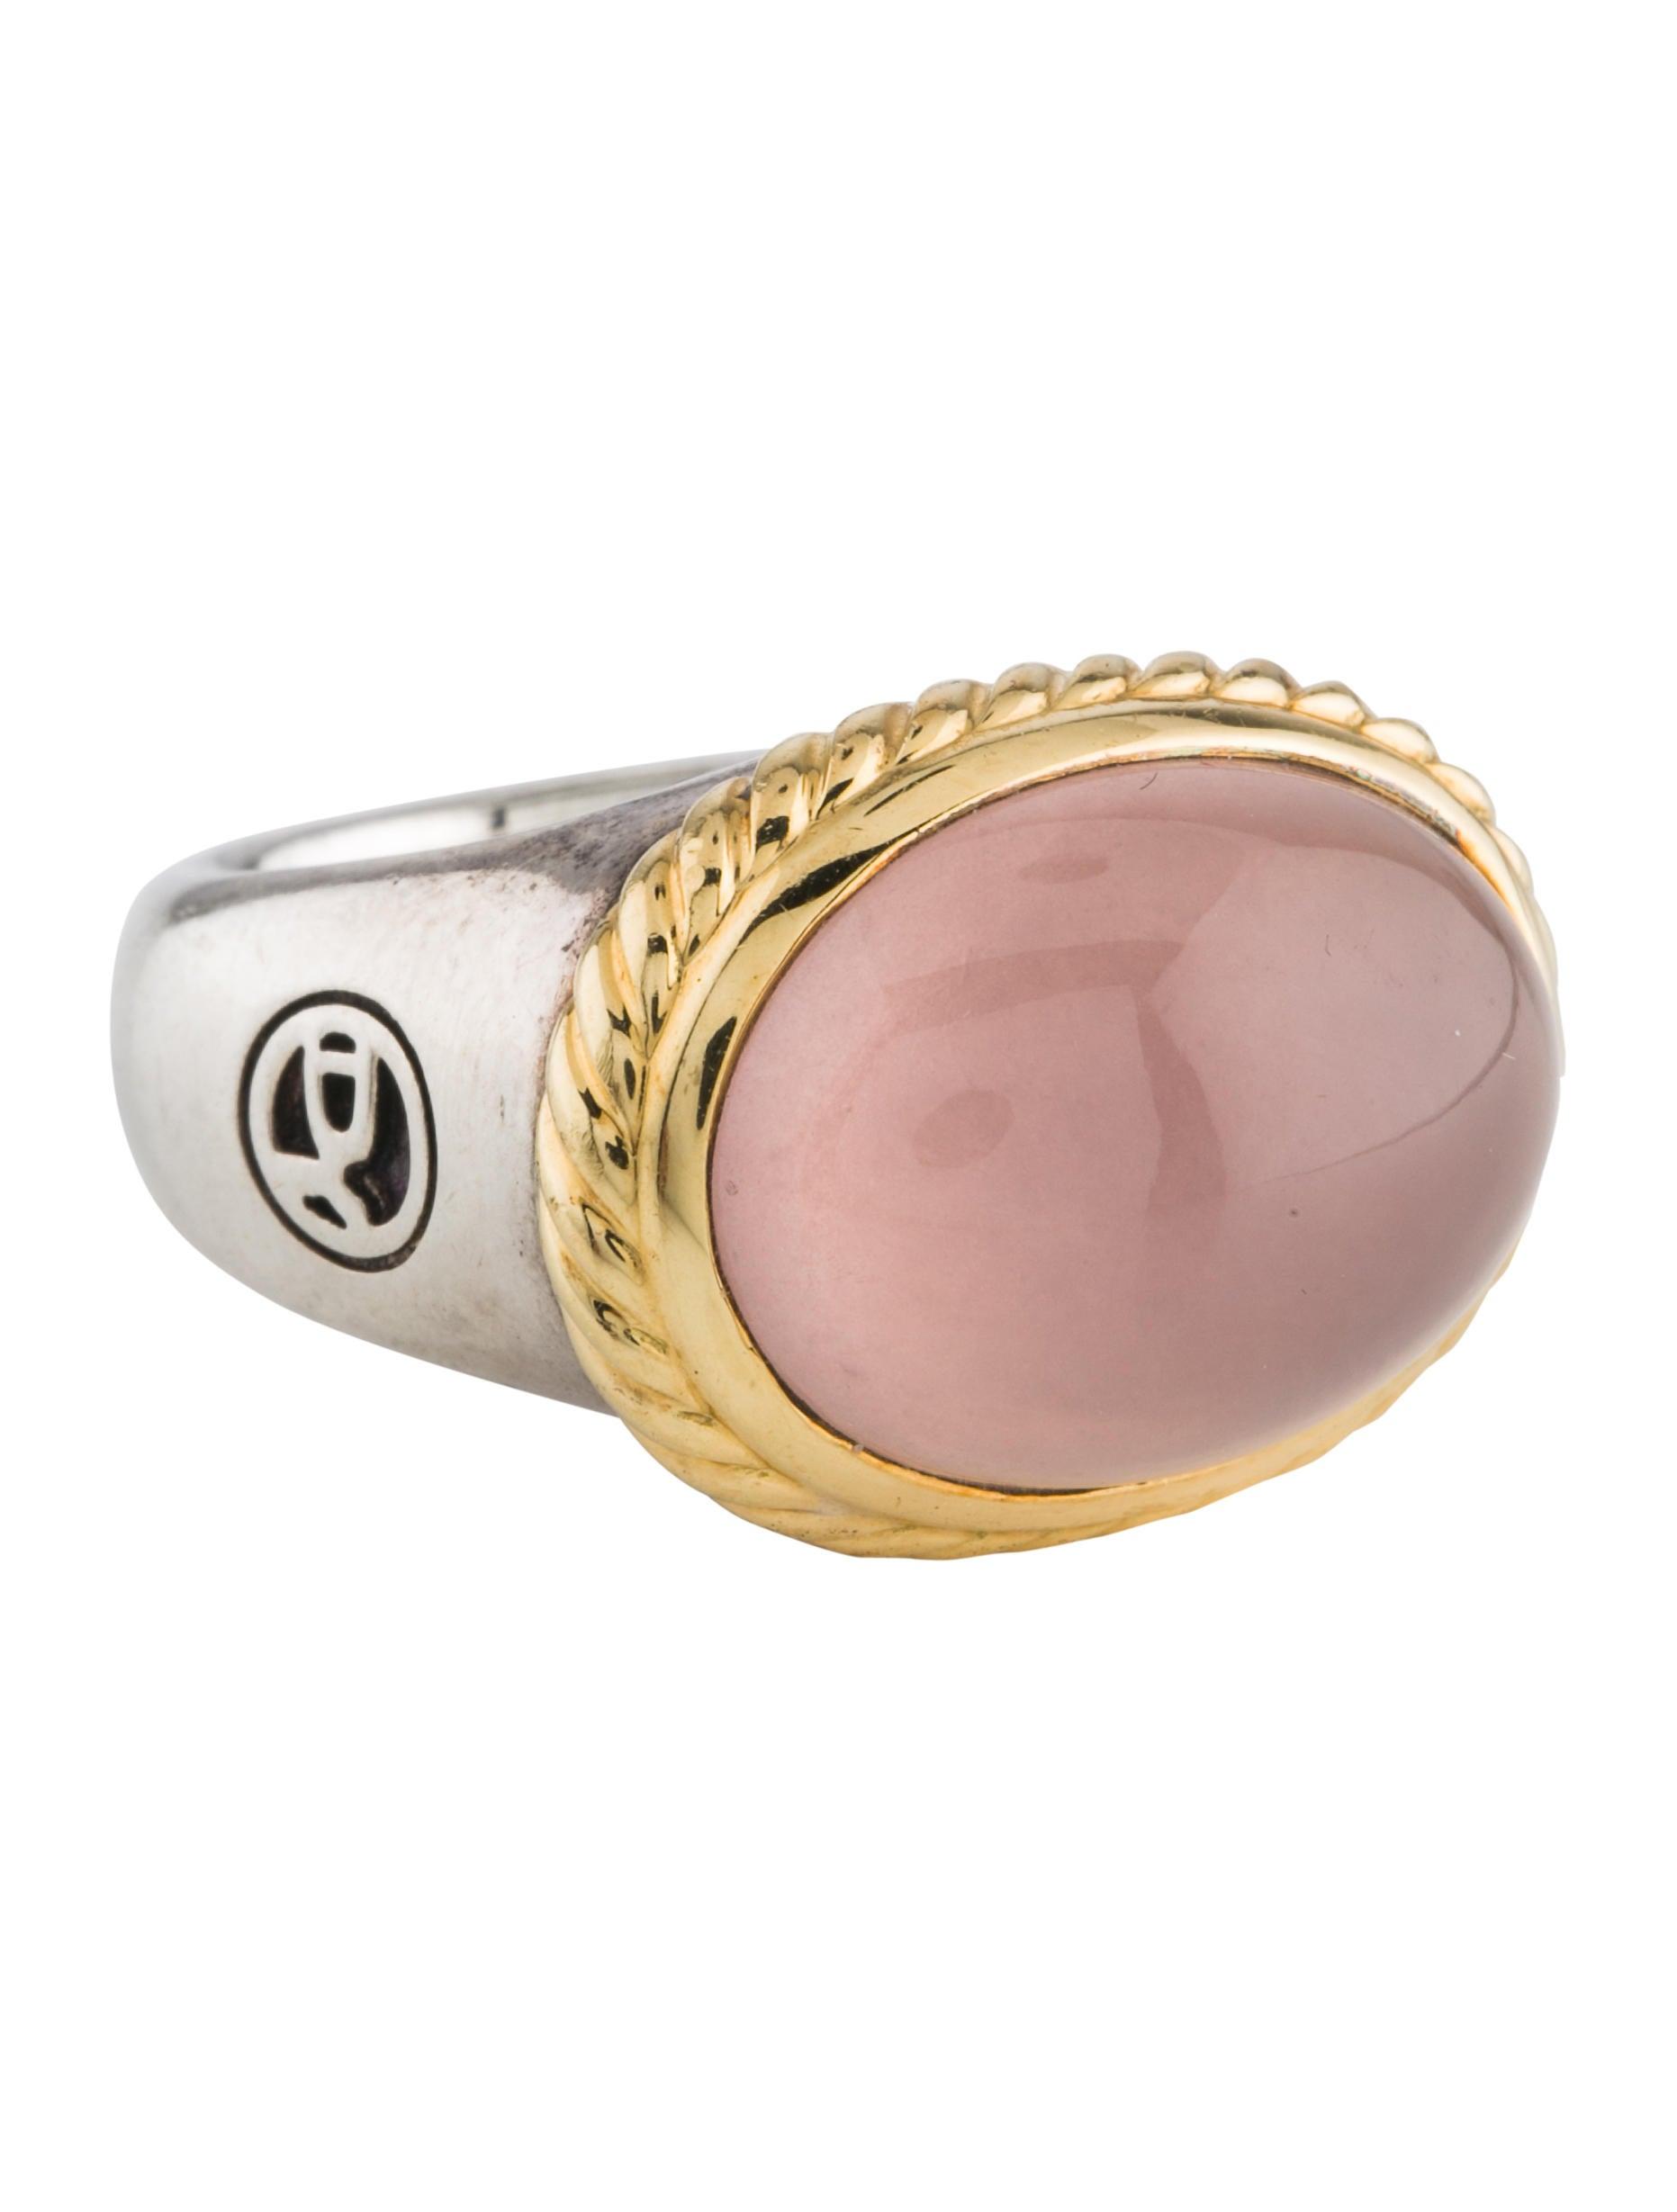 David Yurman Two-Tone Rose Quartz Ring - Rings - DVY51212 | The RealReal